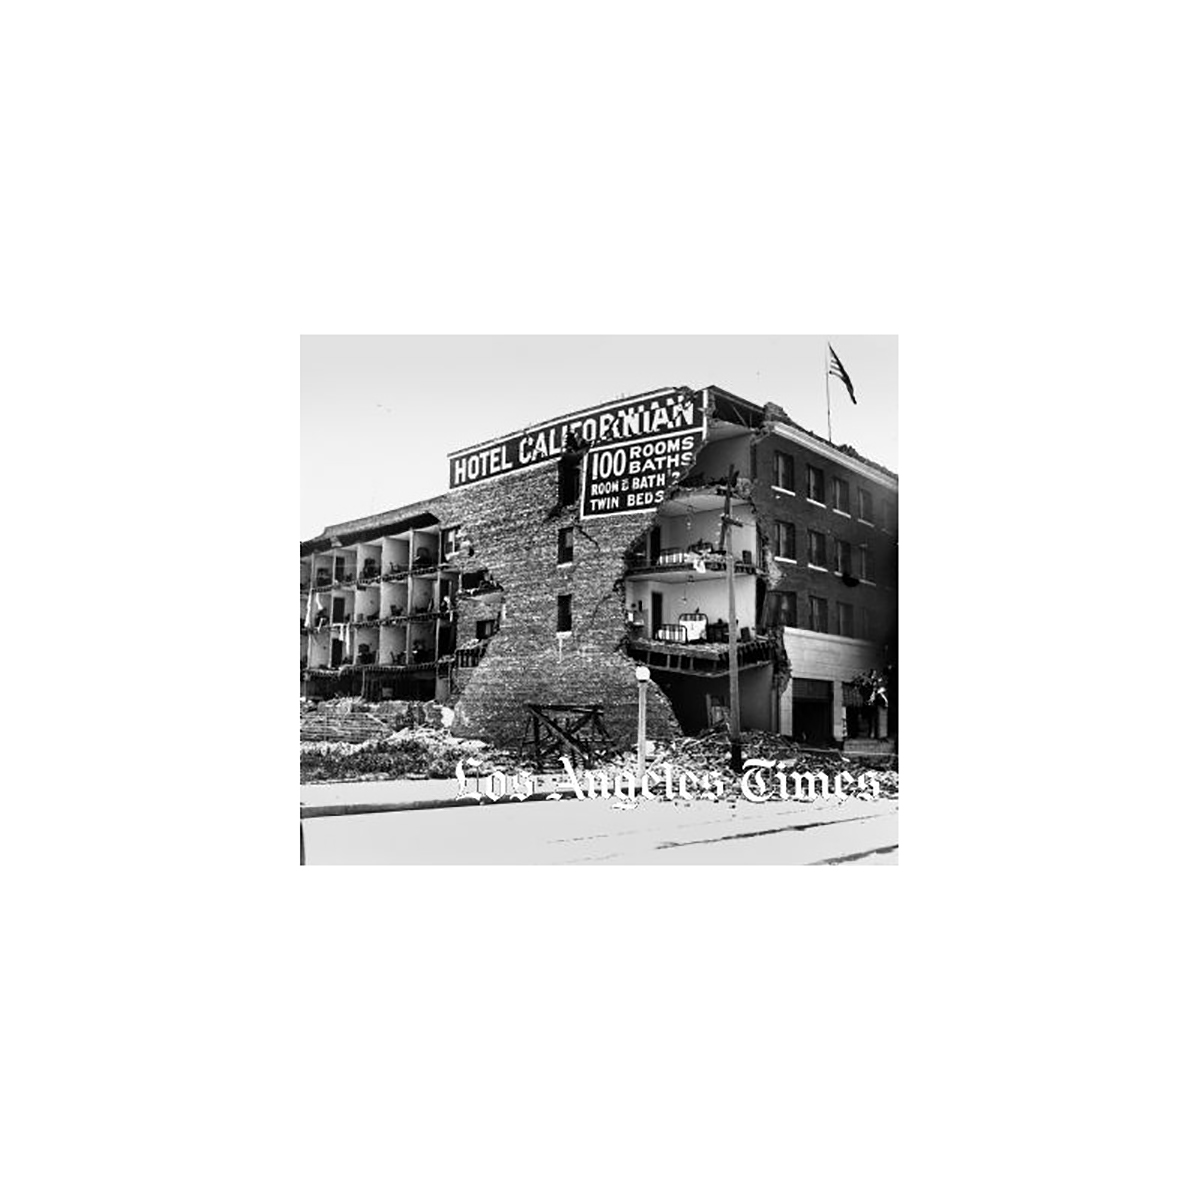 Historical - Hotel Californian